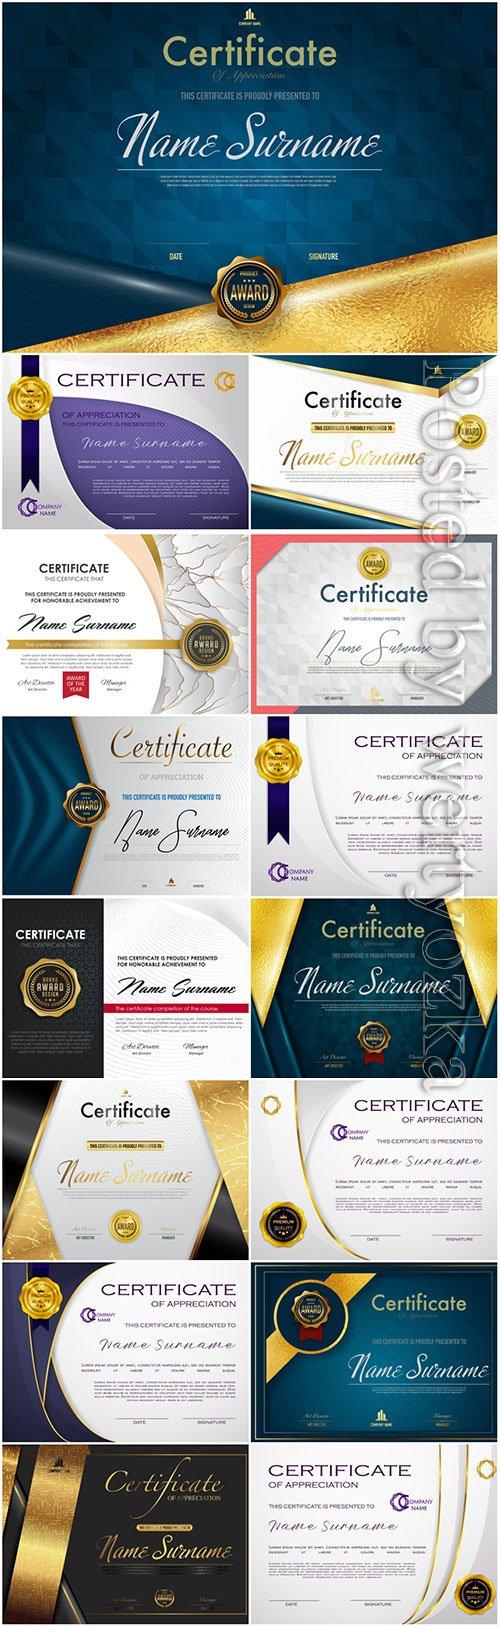 Certificates templates design vector